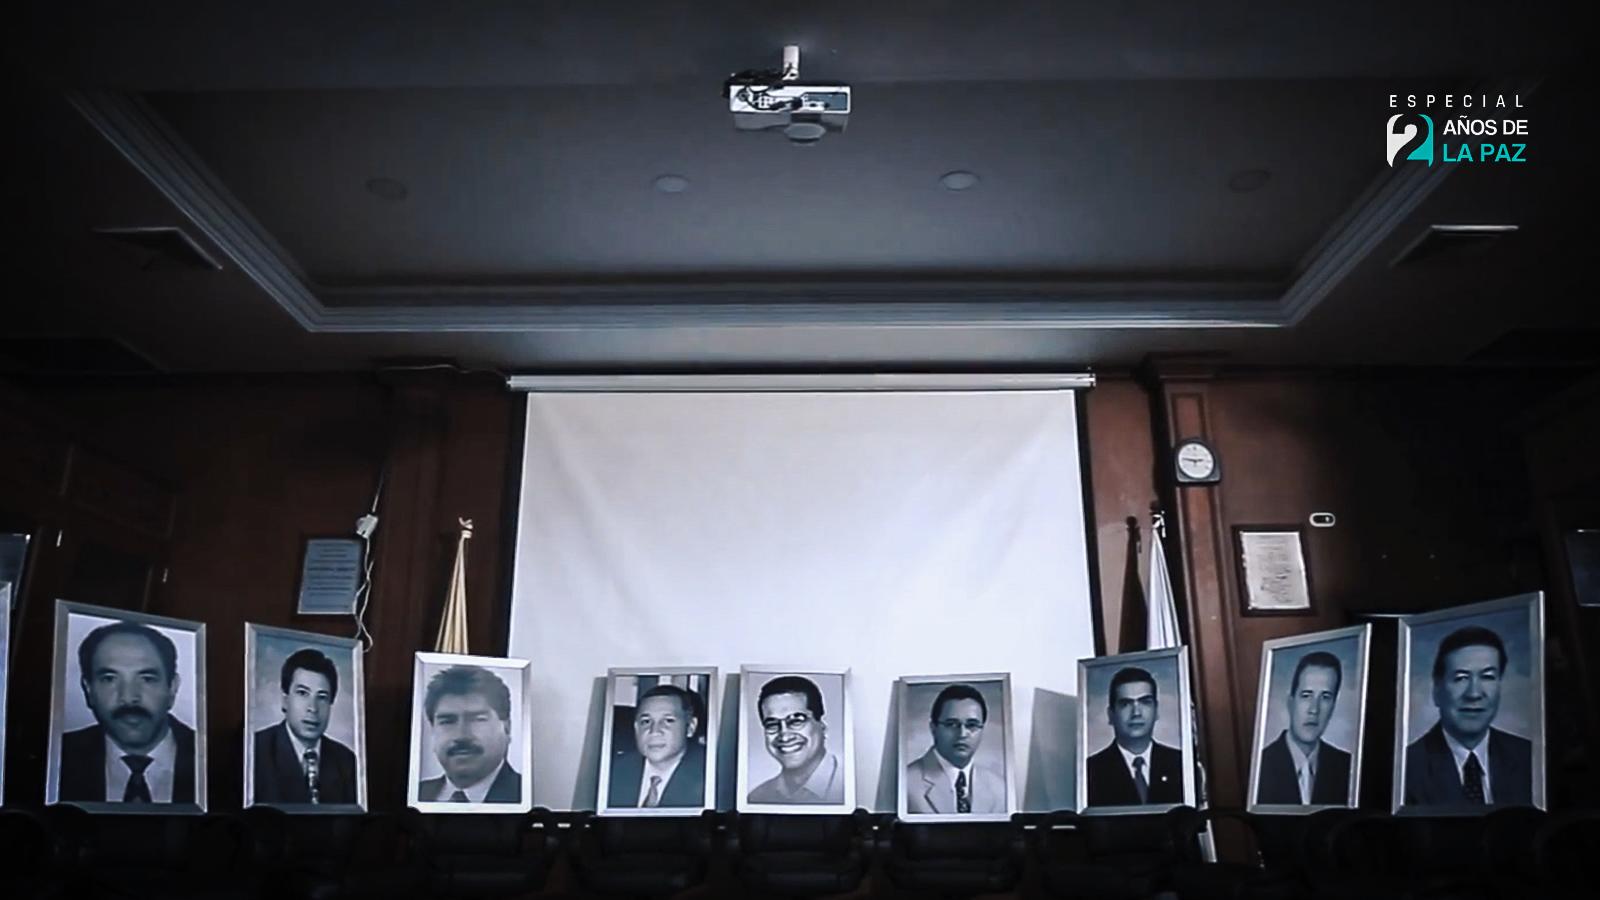 historias/valle-del-cauca/diputados-del-valle-centro-nacional-memoria-historica-